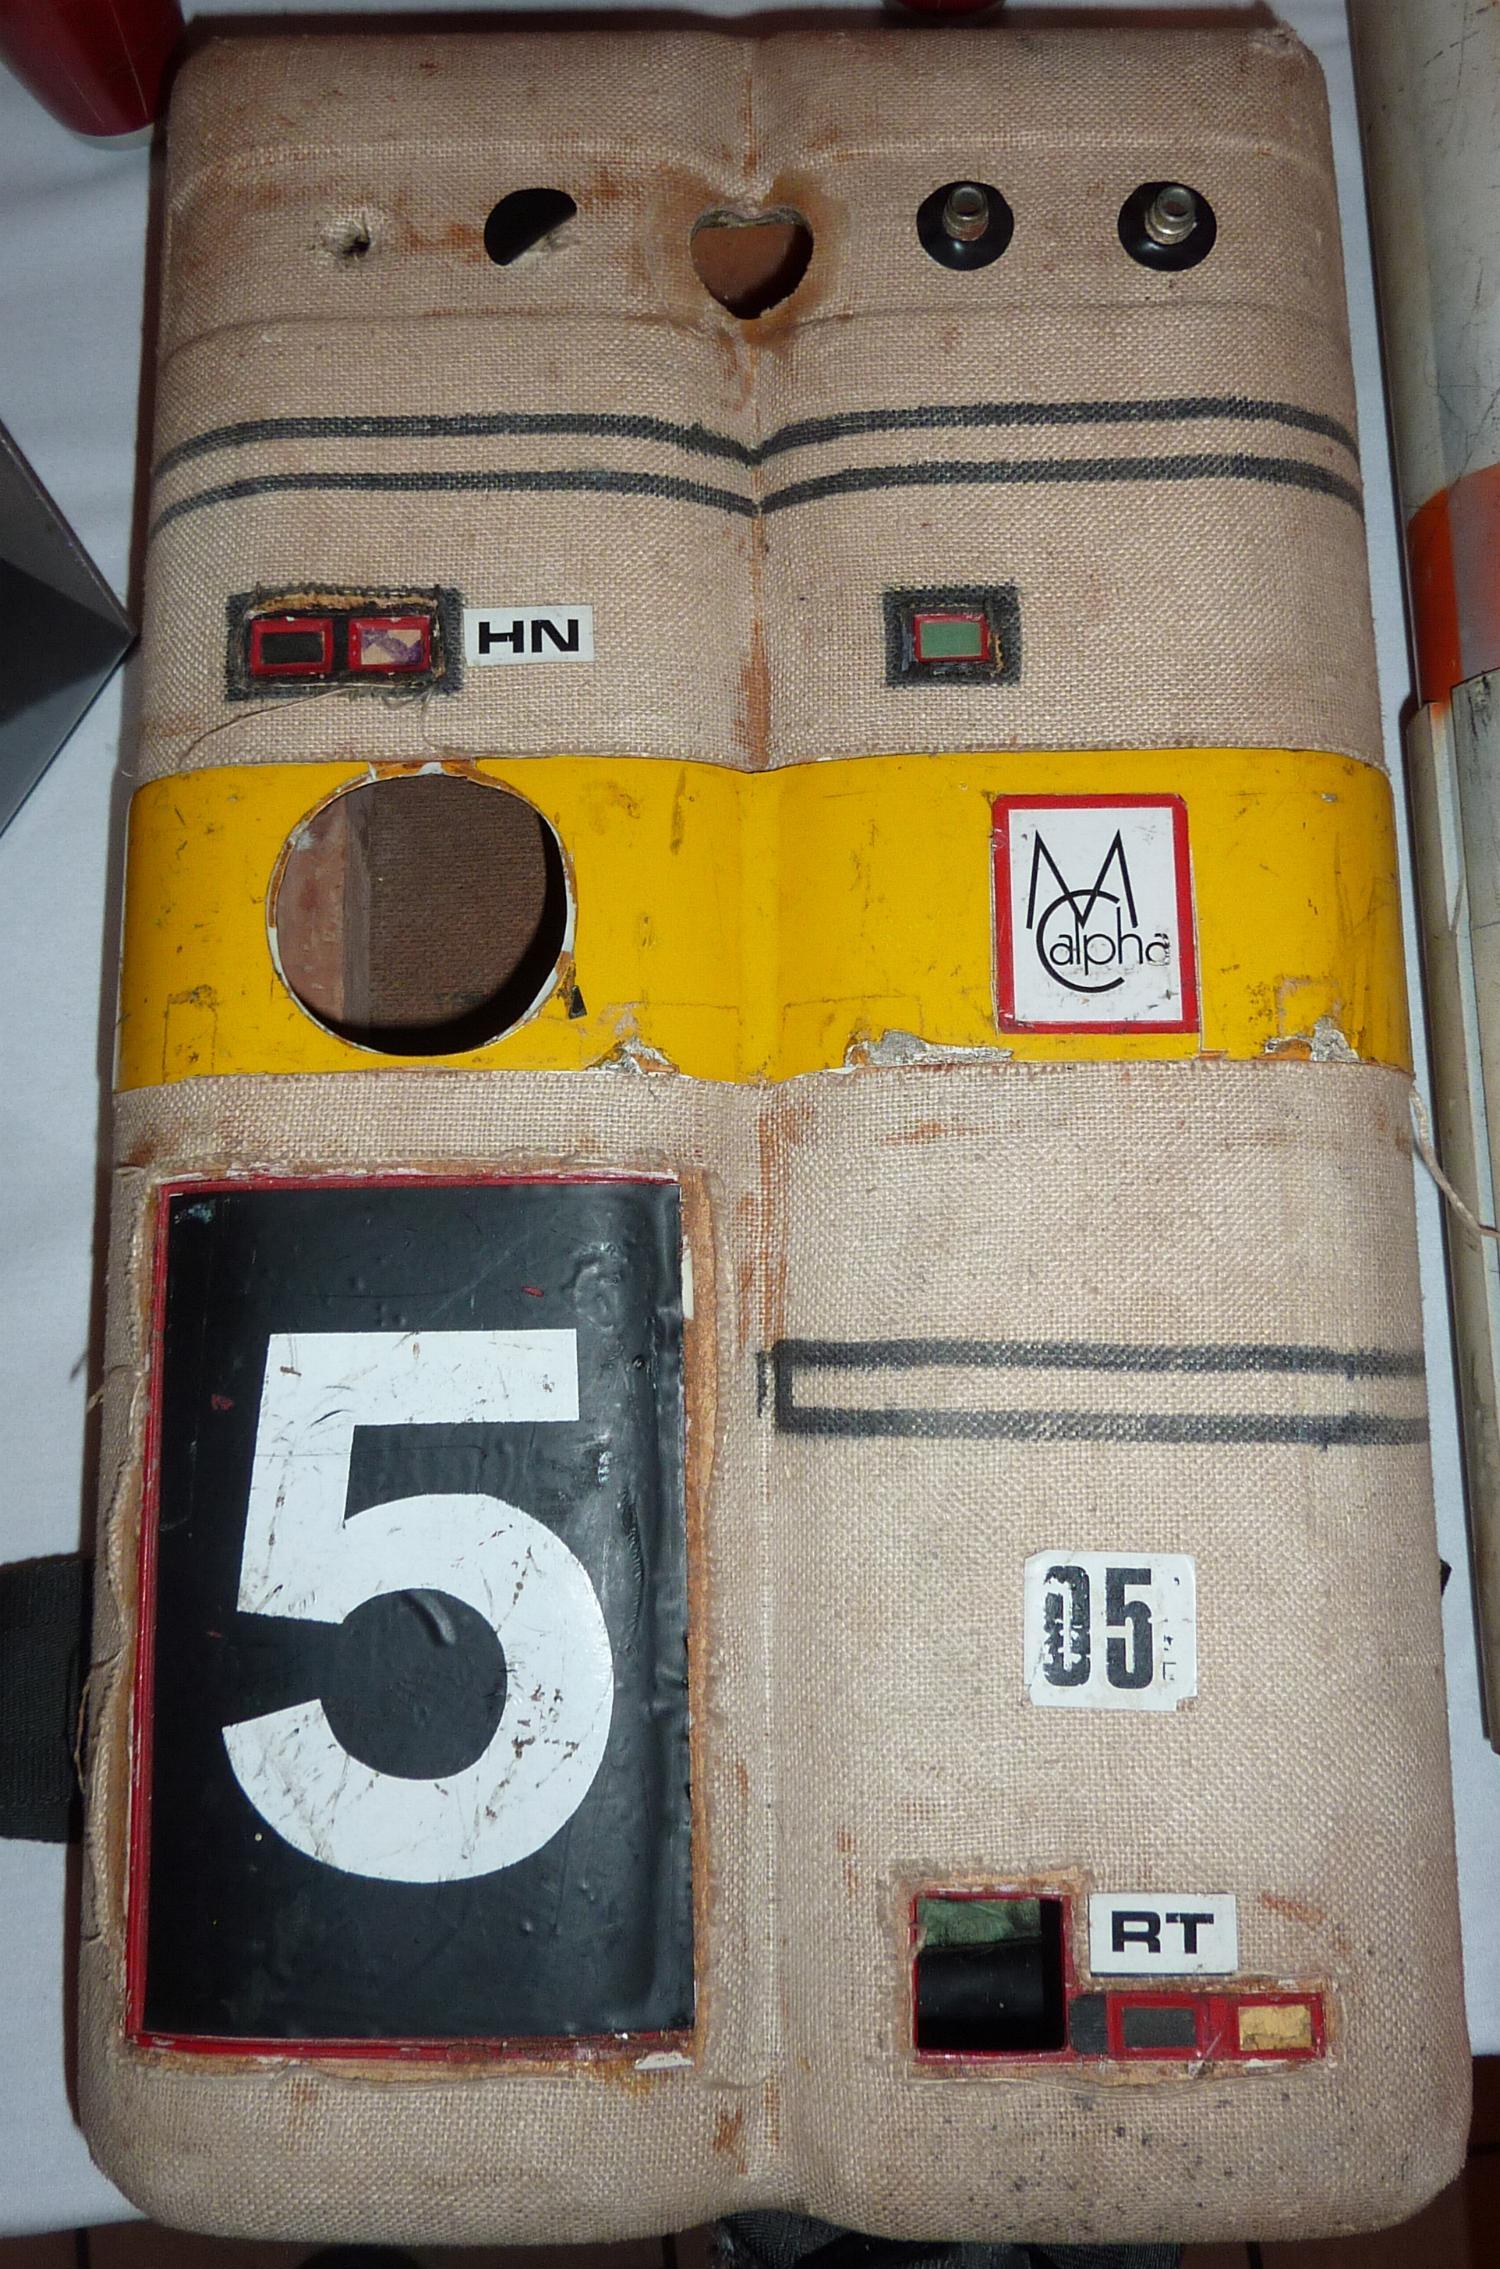 Space 1999 Spacesuit backpack